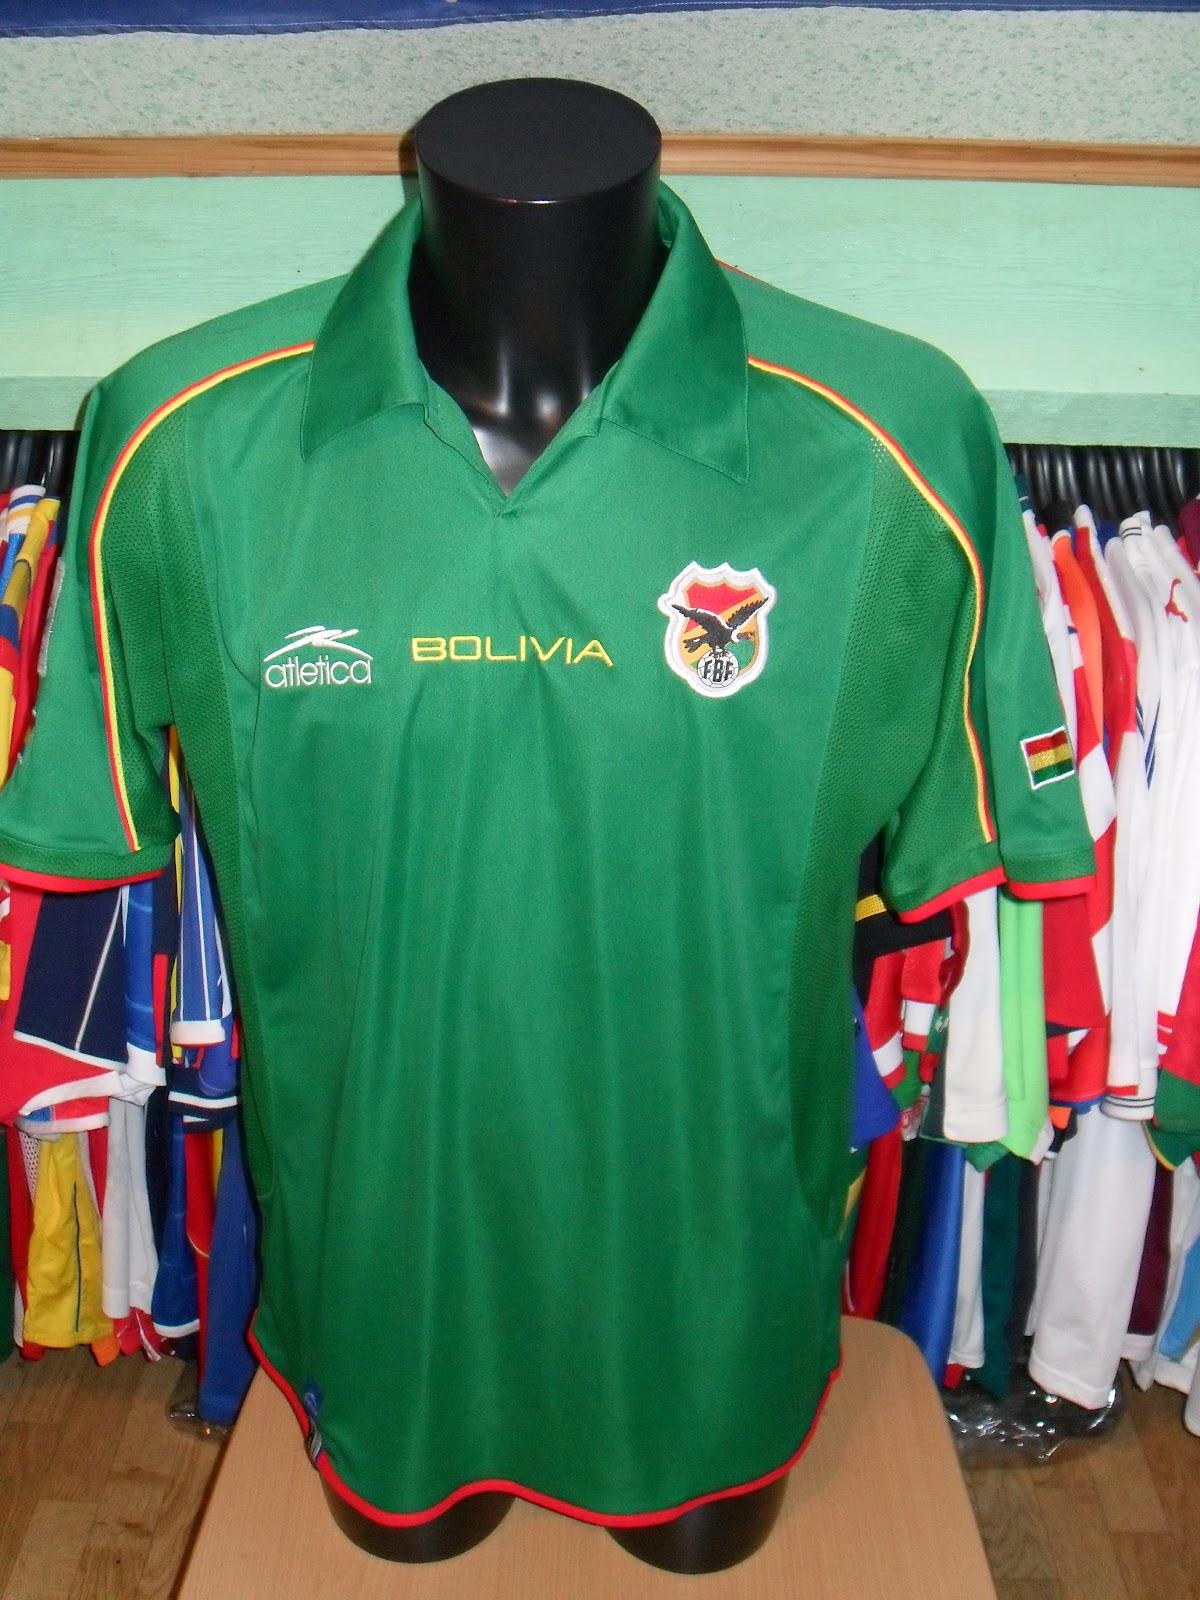 Mon grenier maillots bolivie bolivia 1994 2004 - Lac des cygnes porte maillot ...